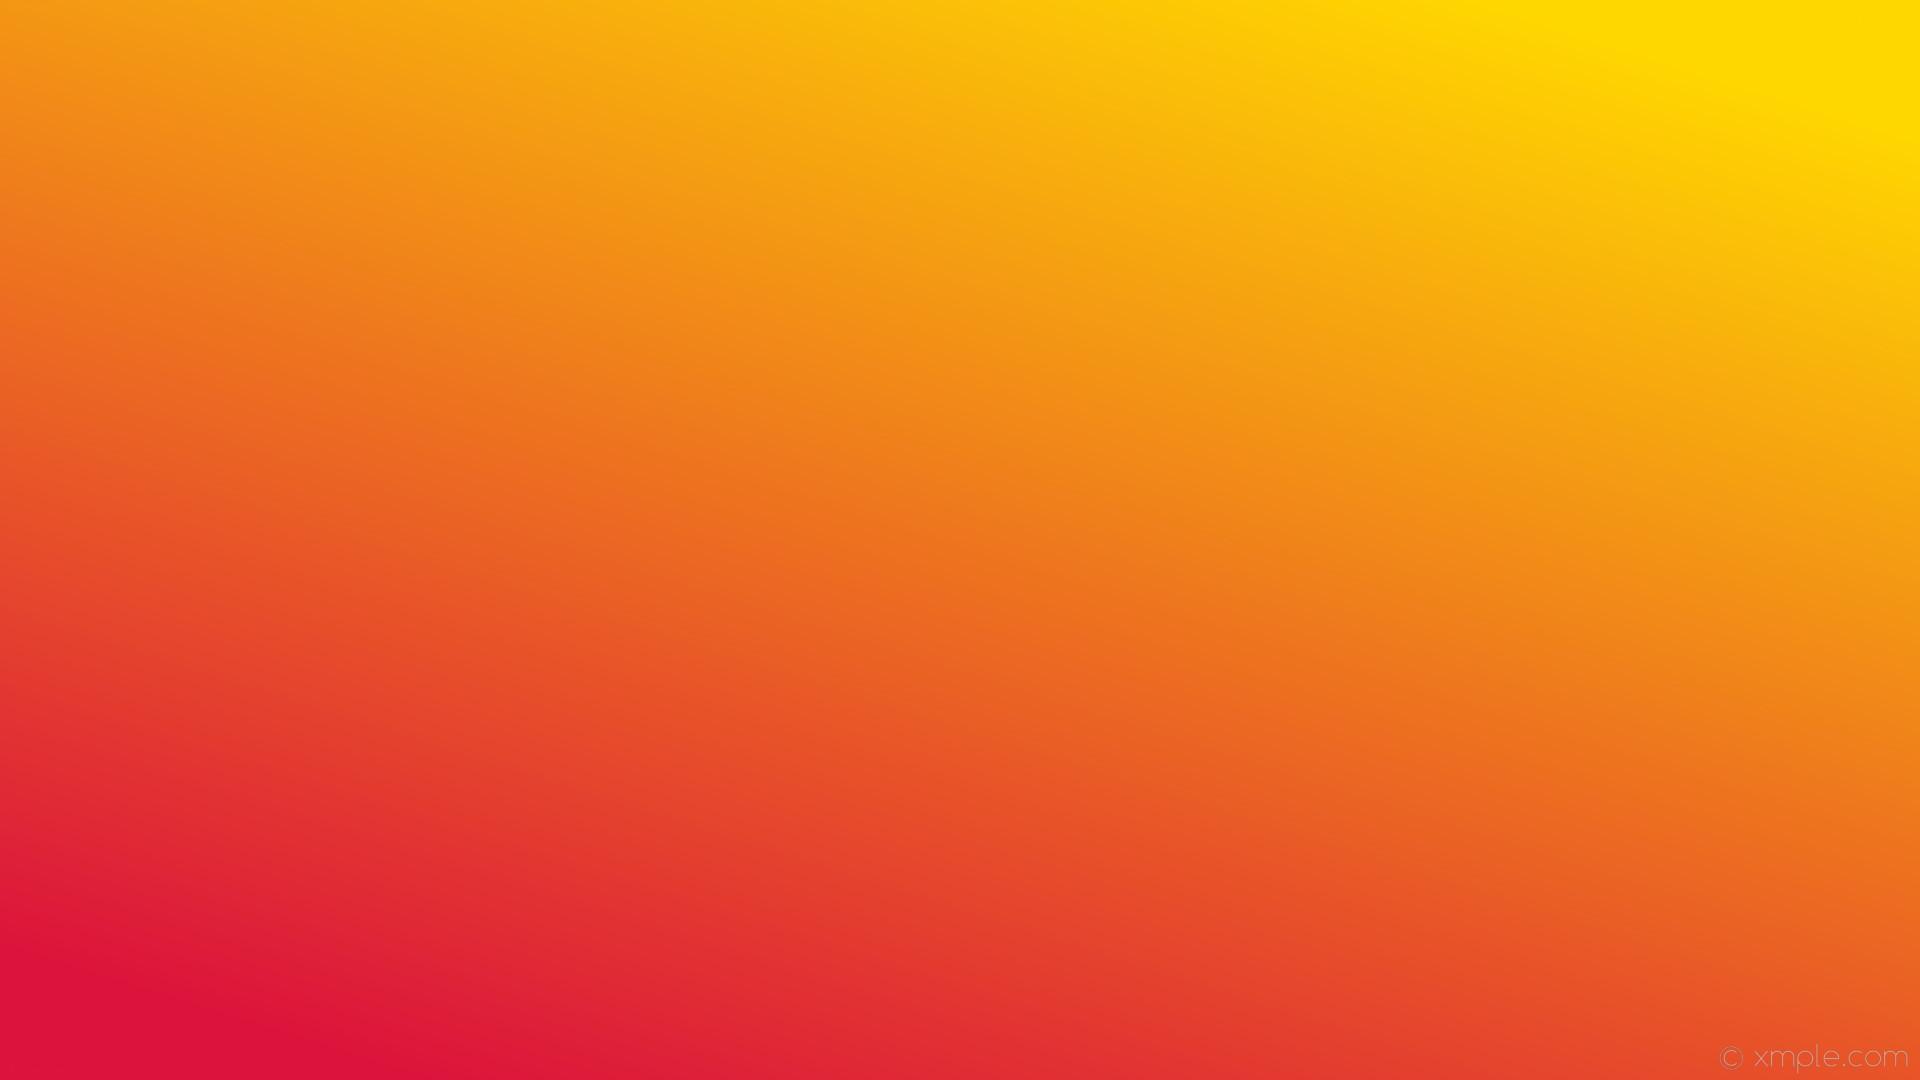 wallpaper linear gradient yellow red gold crimson #ffd700 #dc143c 45°